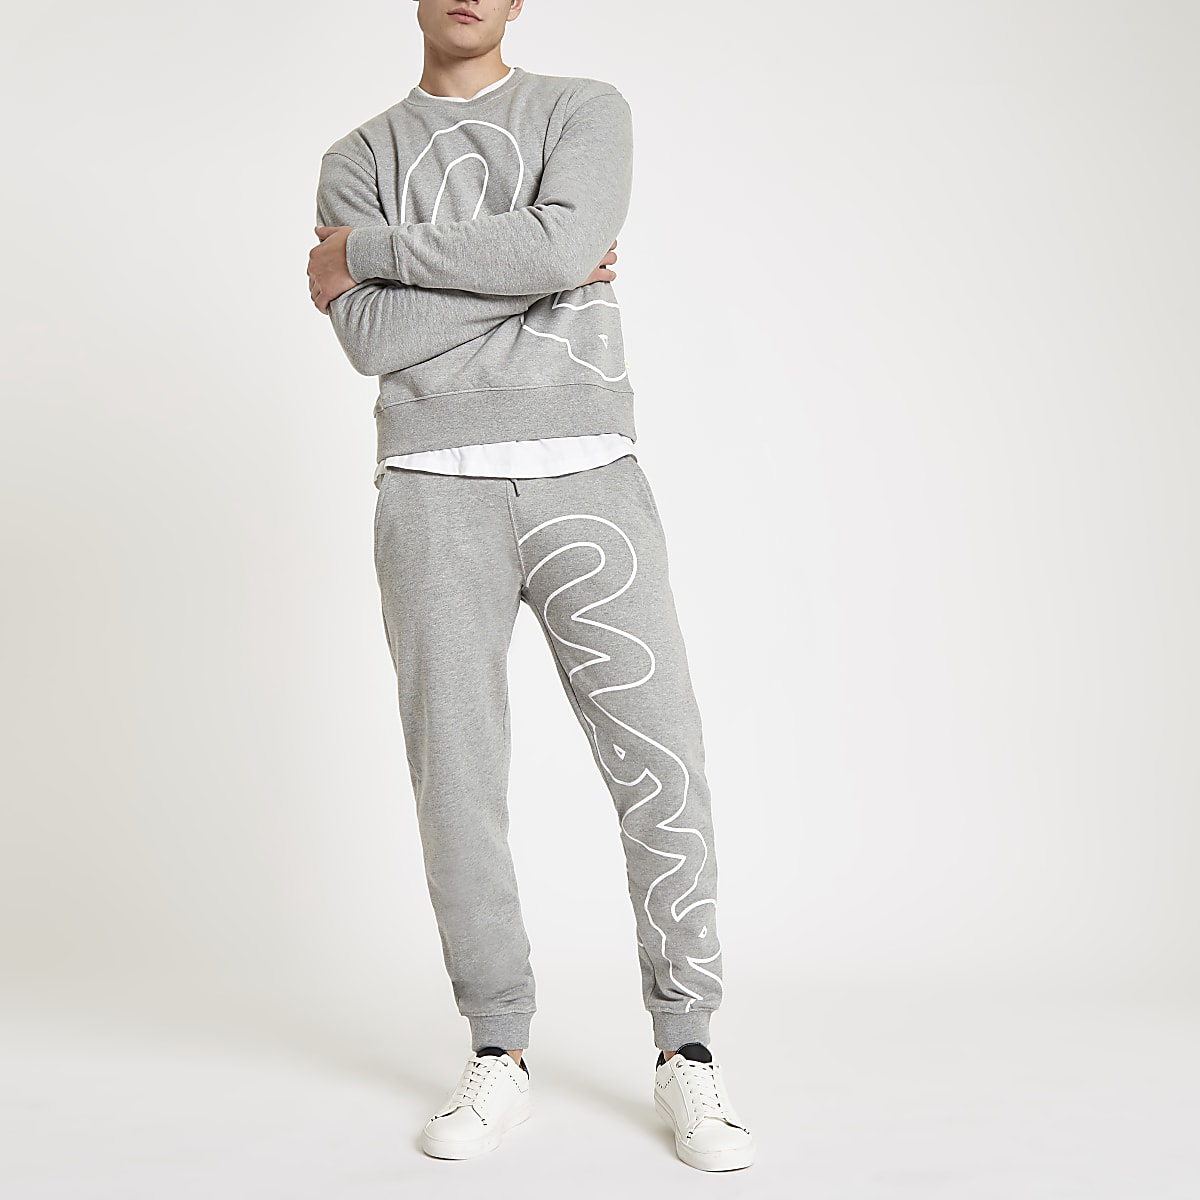 Money Clothing grey big outline joggers